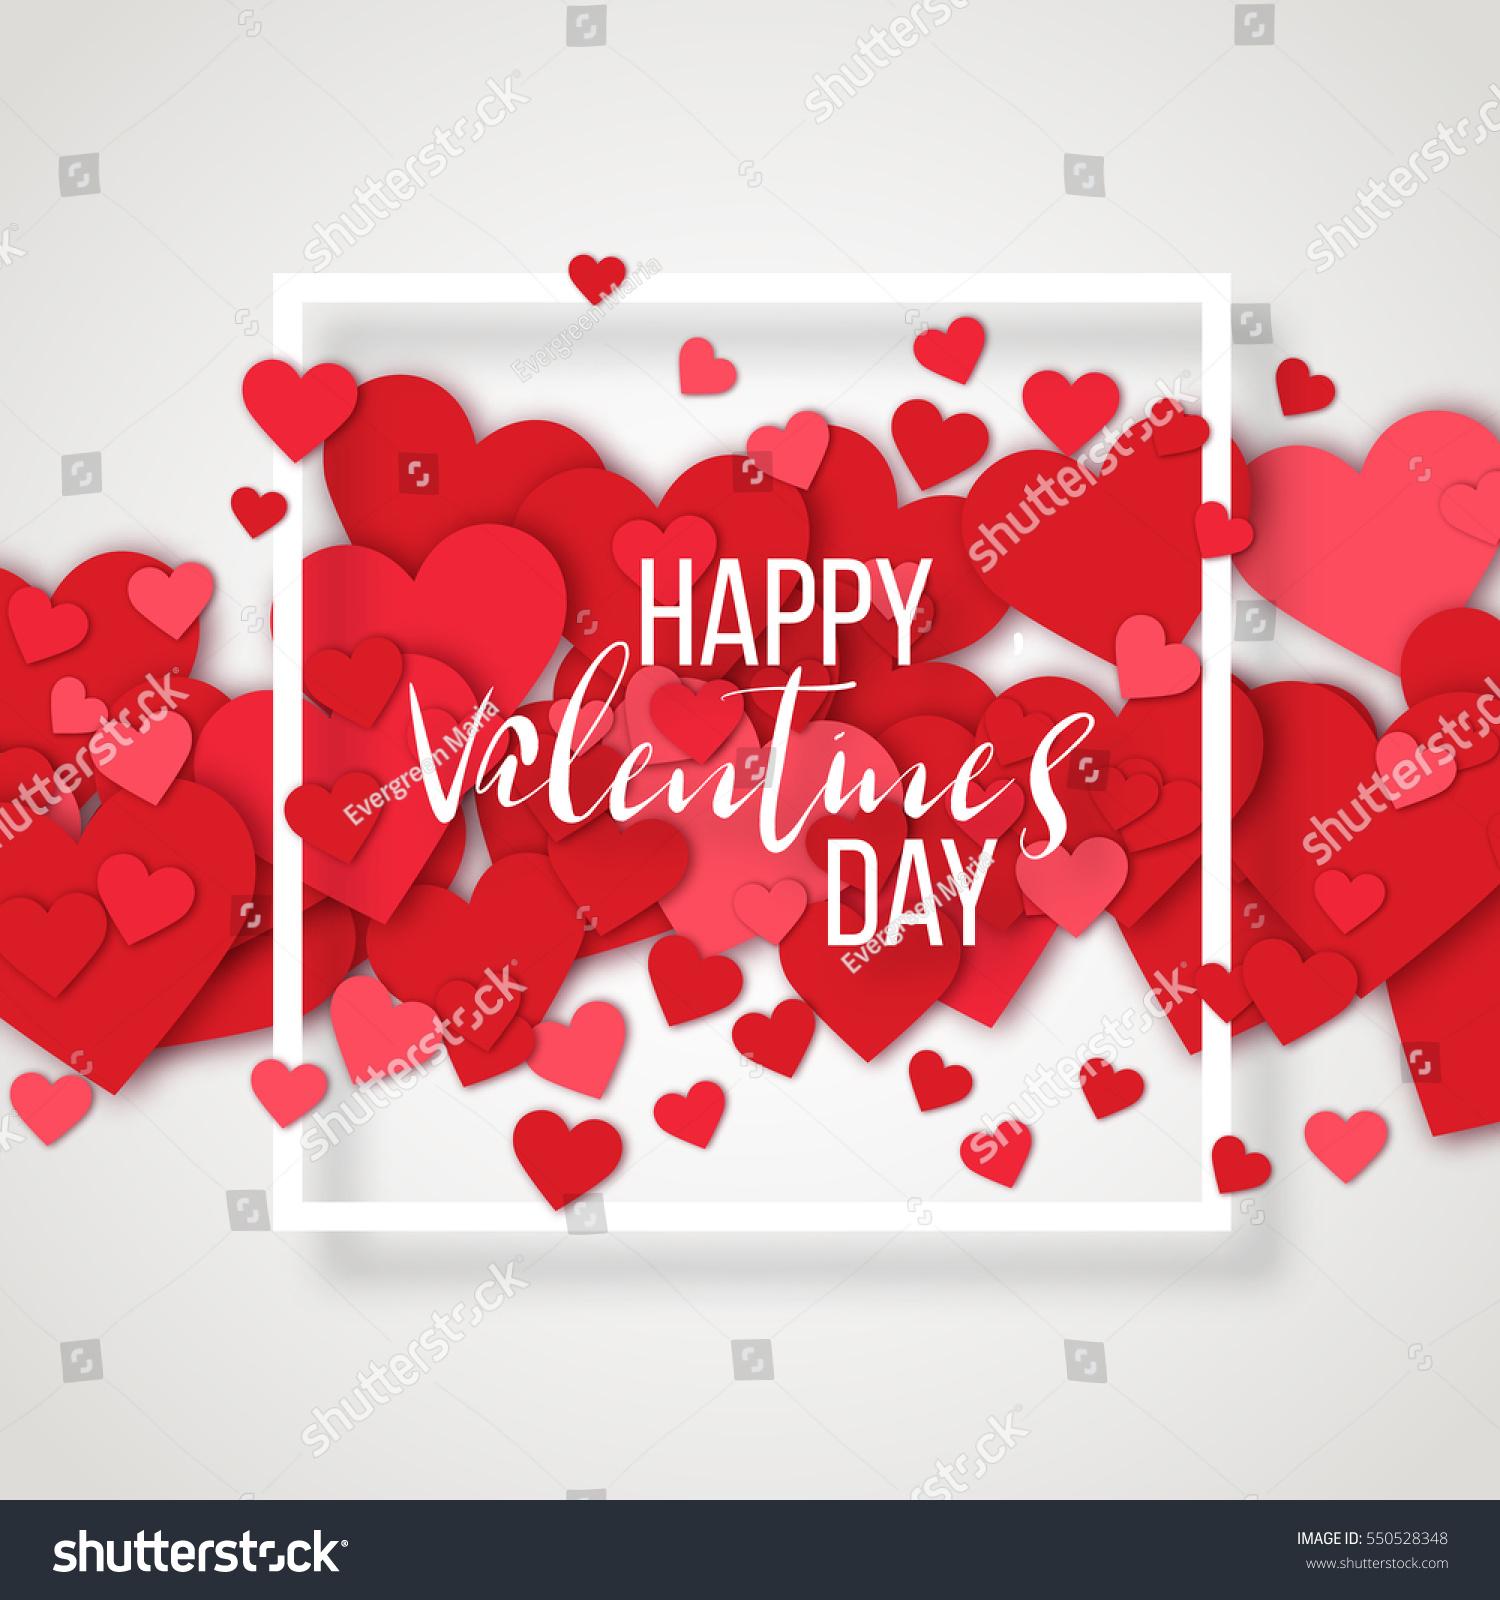 Luxury Elegant Happy Valentine Day Festive Stock Vector 550528348 ...